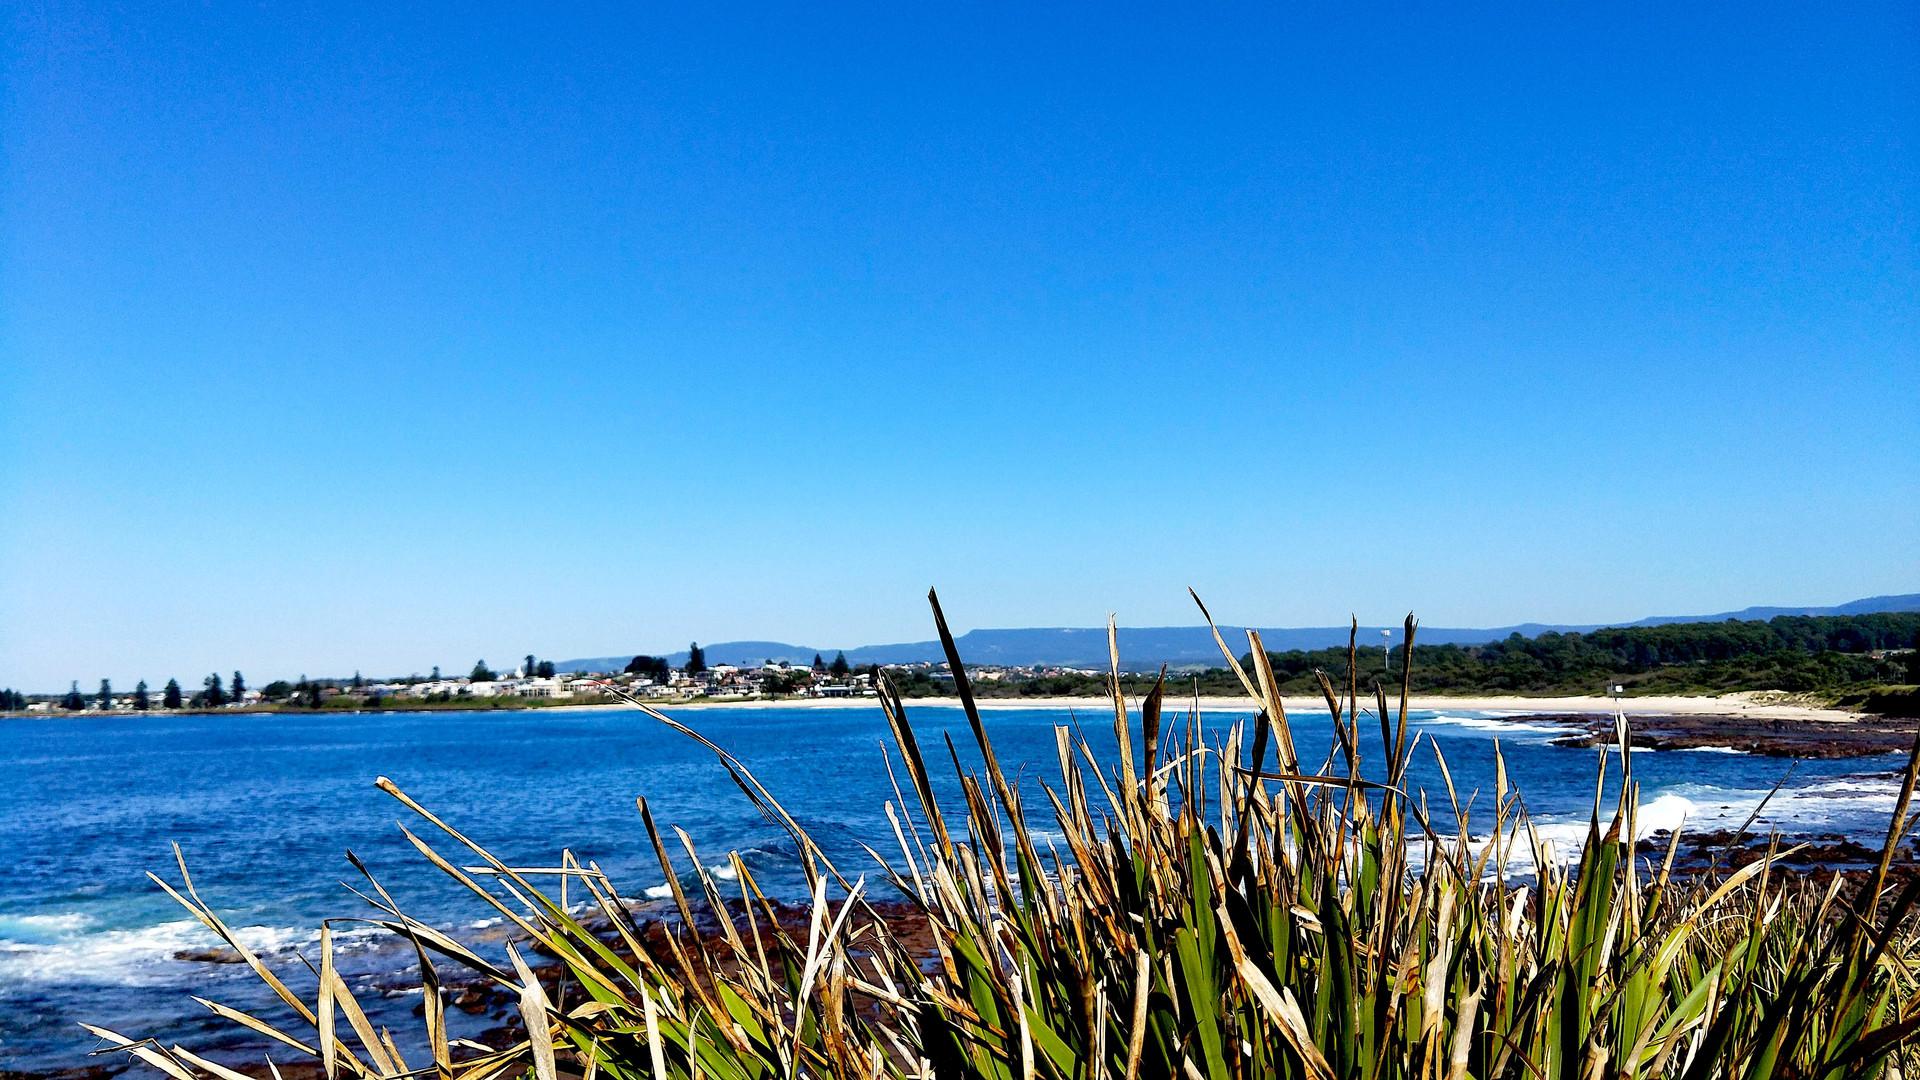 Barrack Point